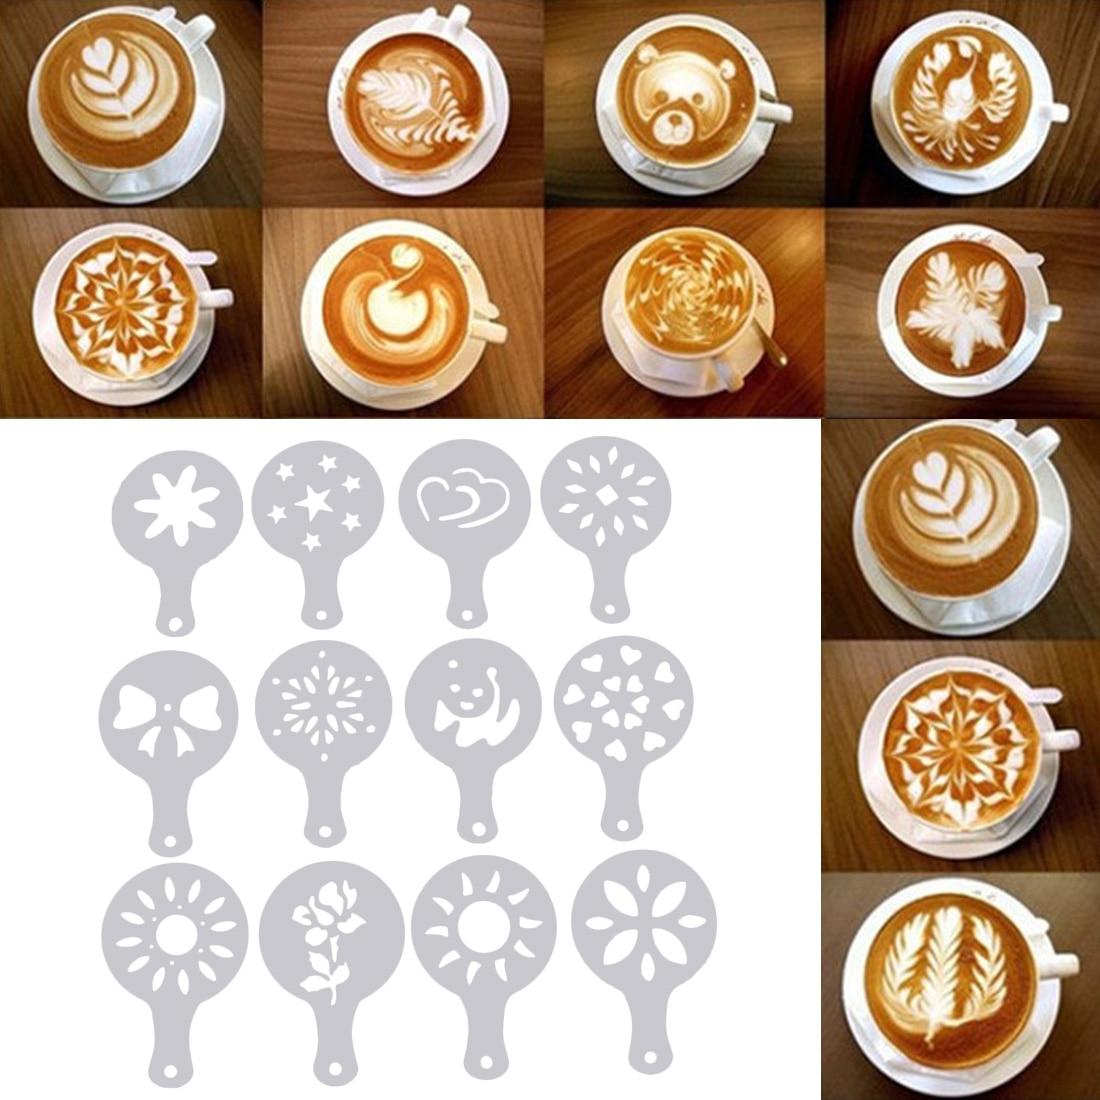 16pcs/12pcs/8pcs Coffee Latte Cappuccino Barista Art Stencils Cake Duster Templates Coffee Tools Accessories